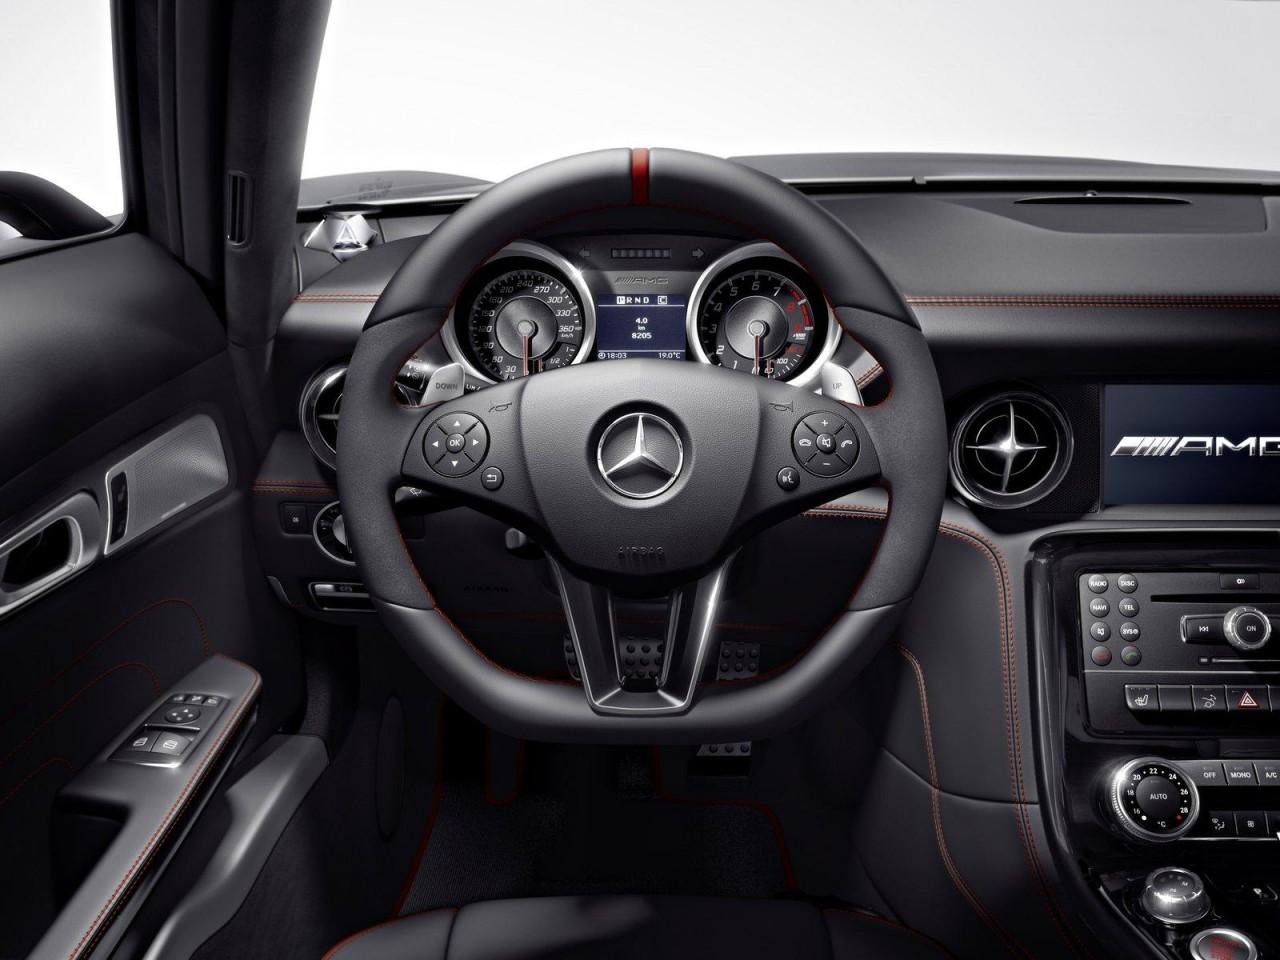 Alfa img showing gt sls amg gt roadster interior - Mercedes Benz Sls Amg Gt Dash